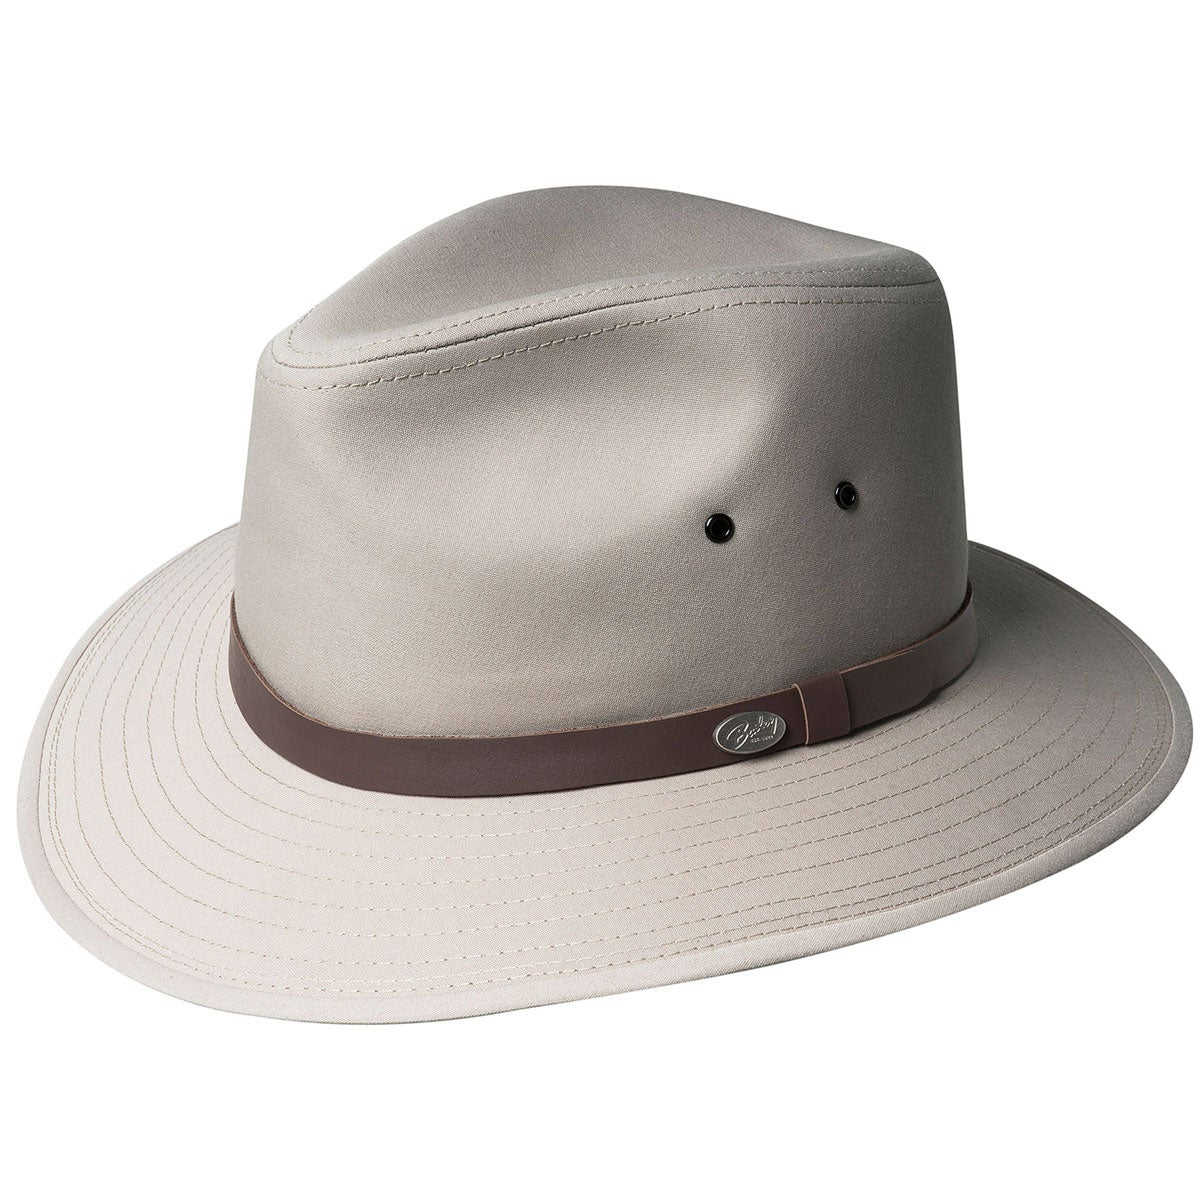 1950s Mens Hats | 50s Vintage Men's Hats Dalton Safari Outback $65.00 AT vintagedancer.com